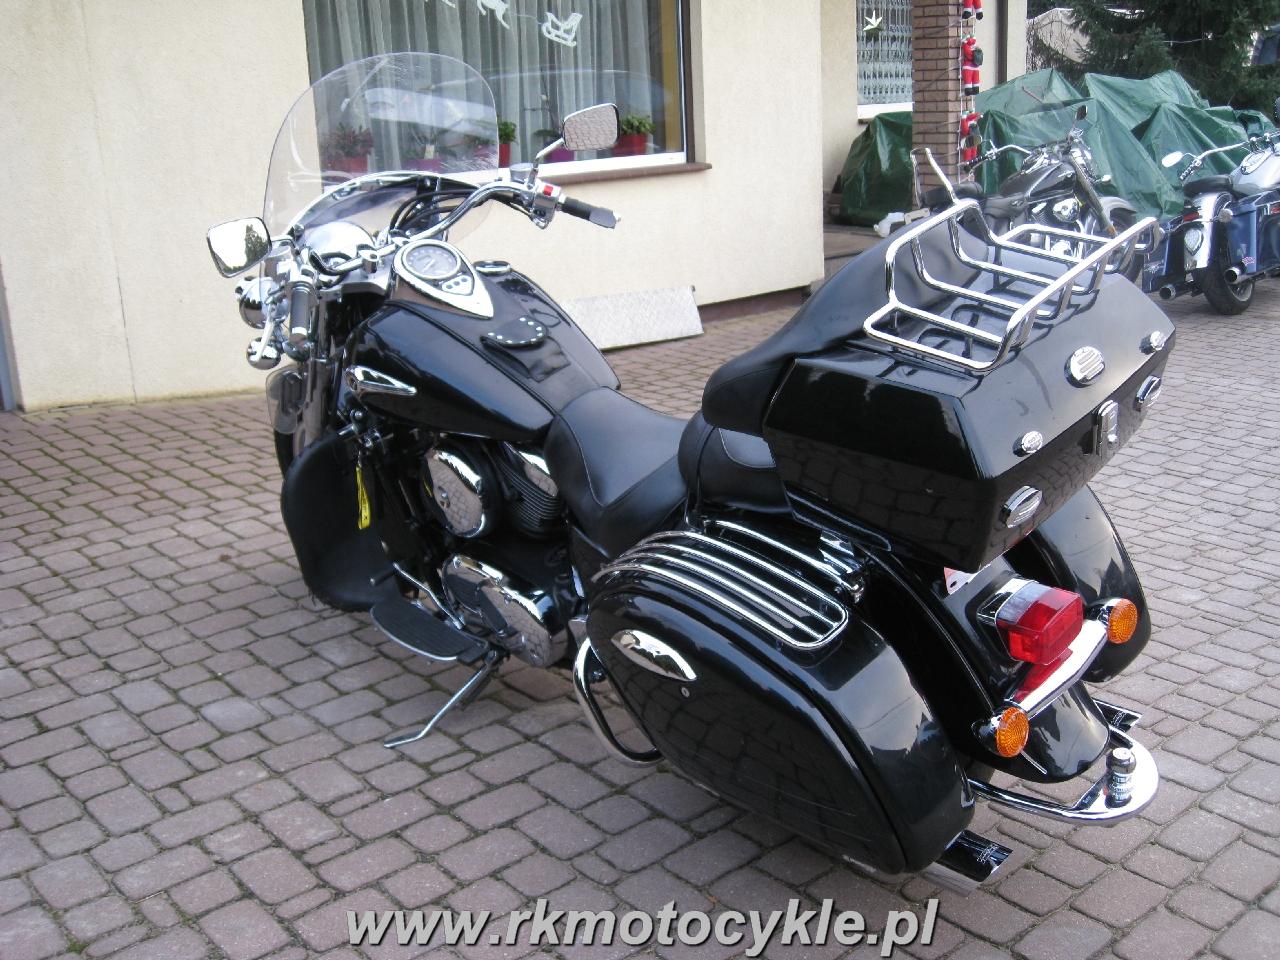 Rk Motocykle Kawasaki Vn1500 Vulcan Nomad Vn 1500 Vn 1600